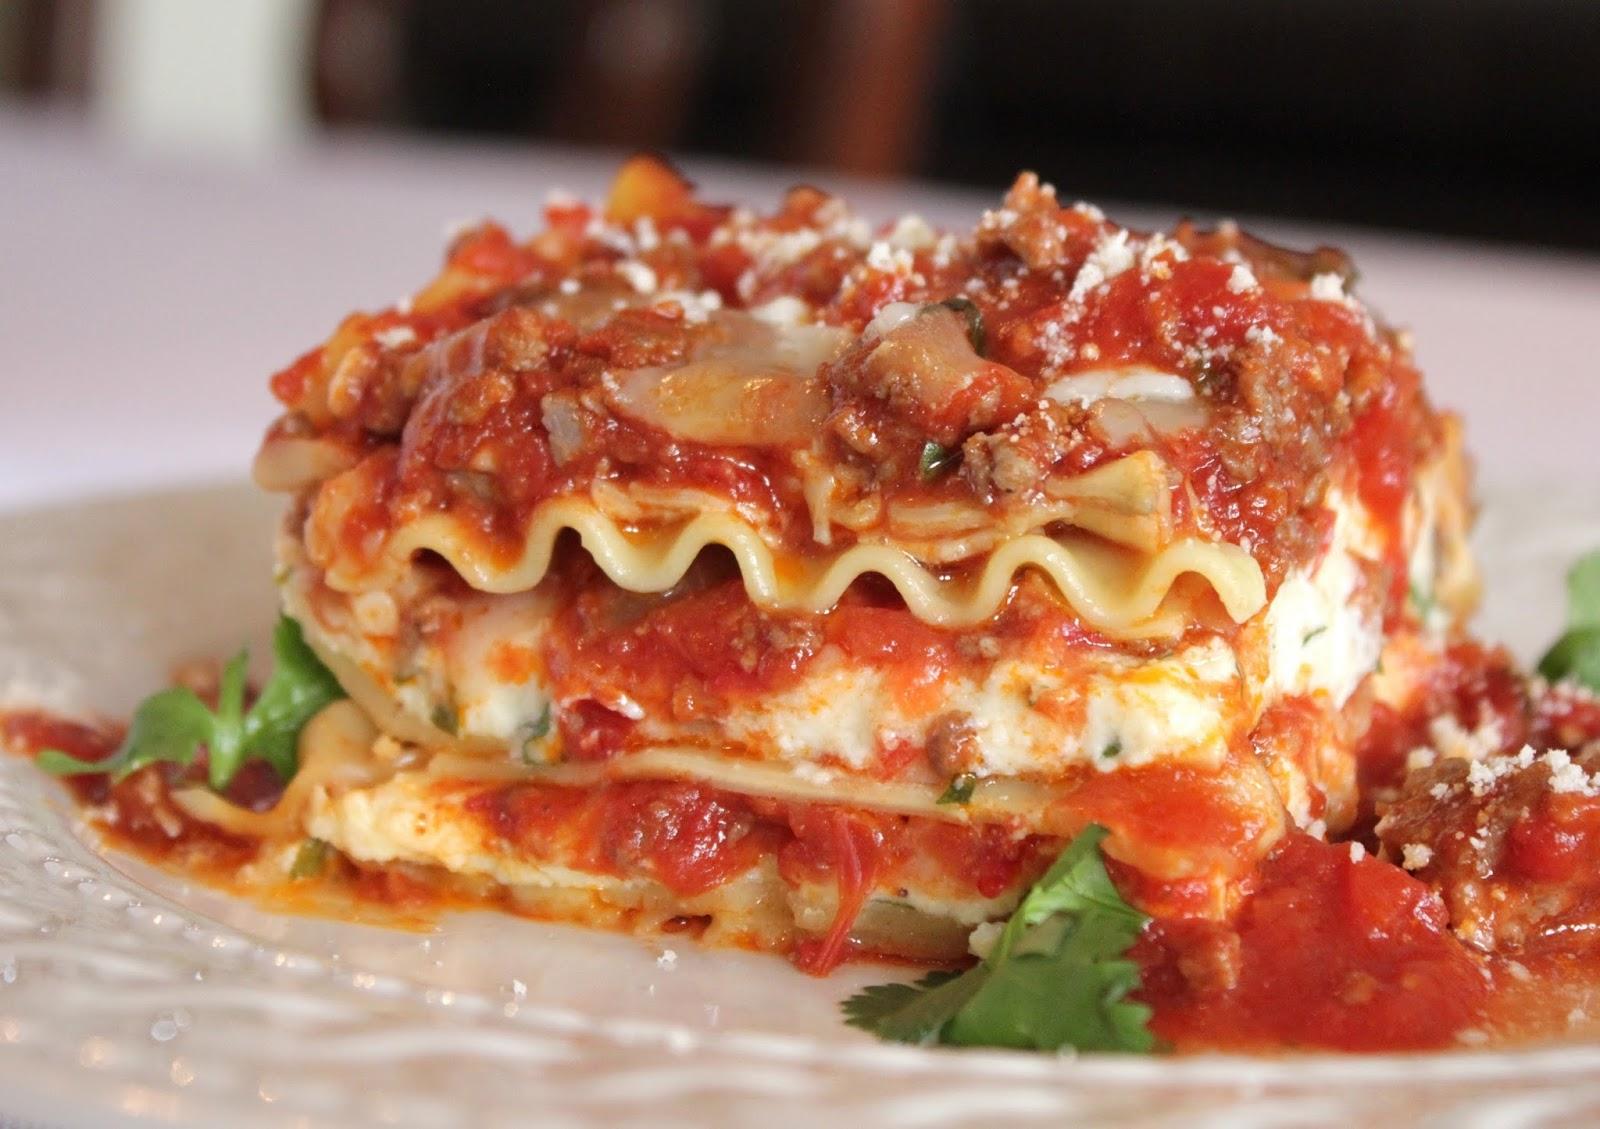 guglielmo vallecoccia top   eat famous italian food